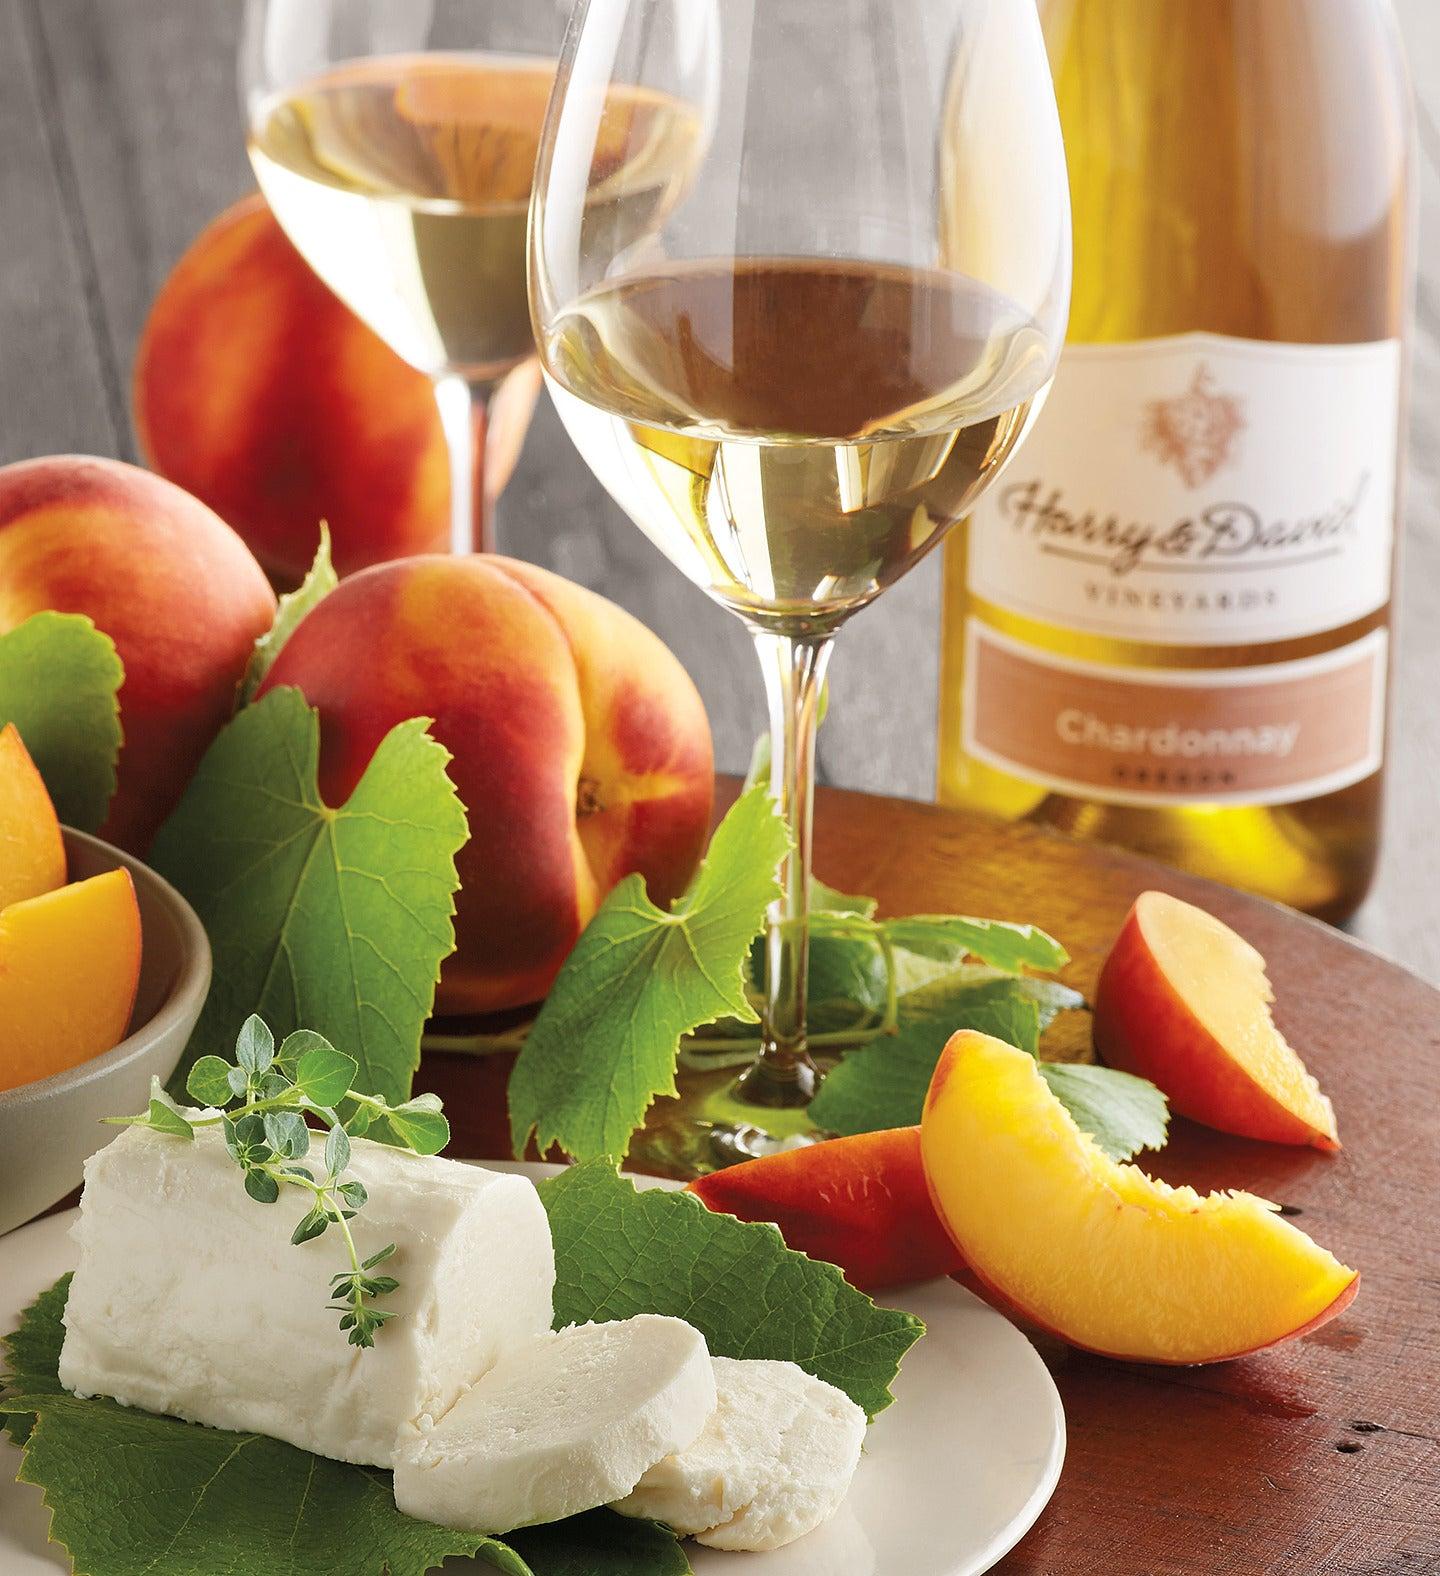 Oregold Peaches Honey Goat Cheese and Harry  Davidtrade Chardonnay